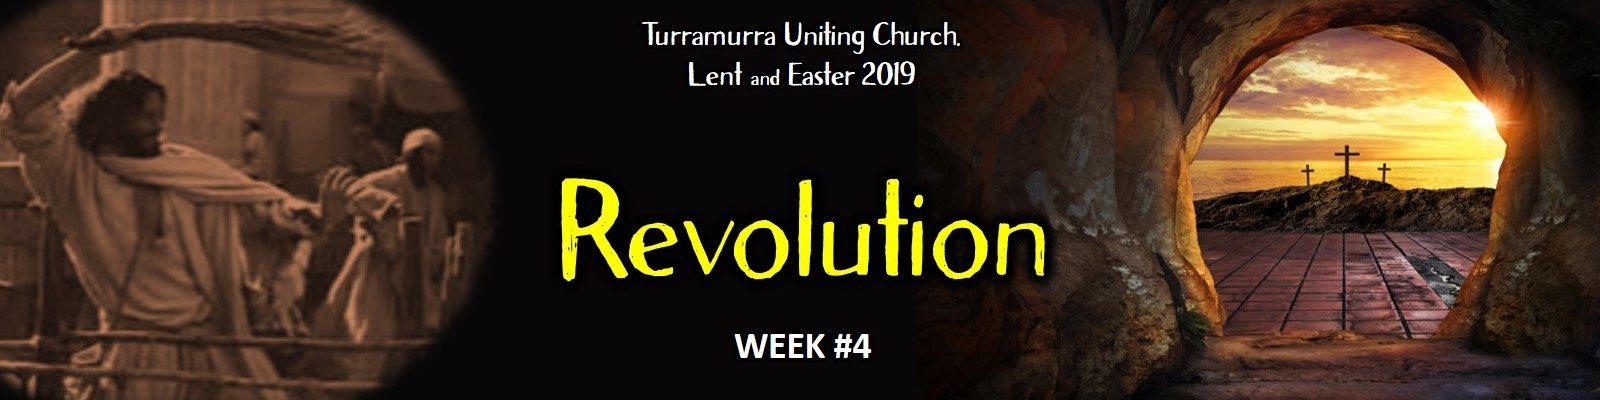 Lent Bible Study #4 - Revolution